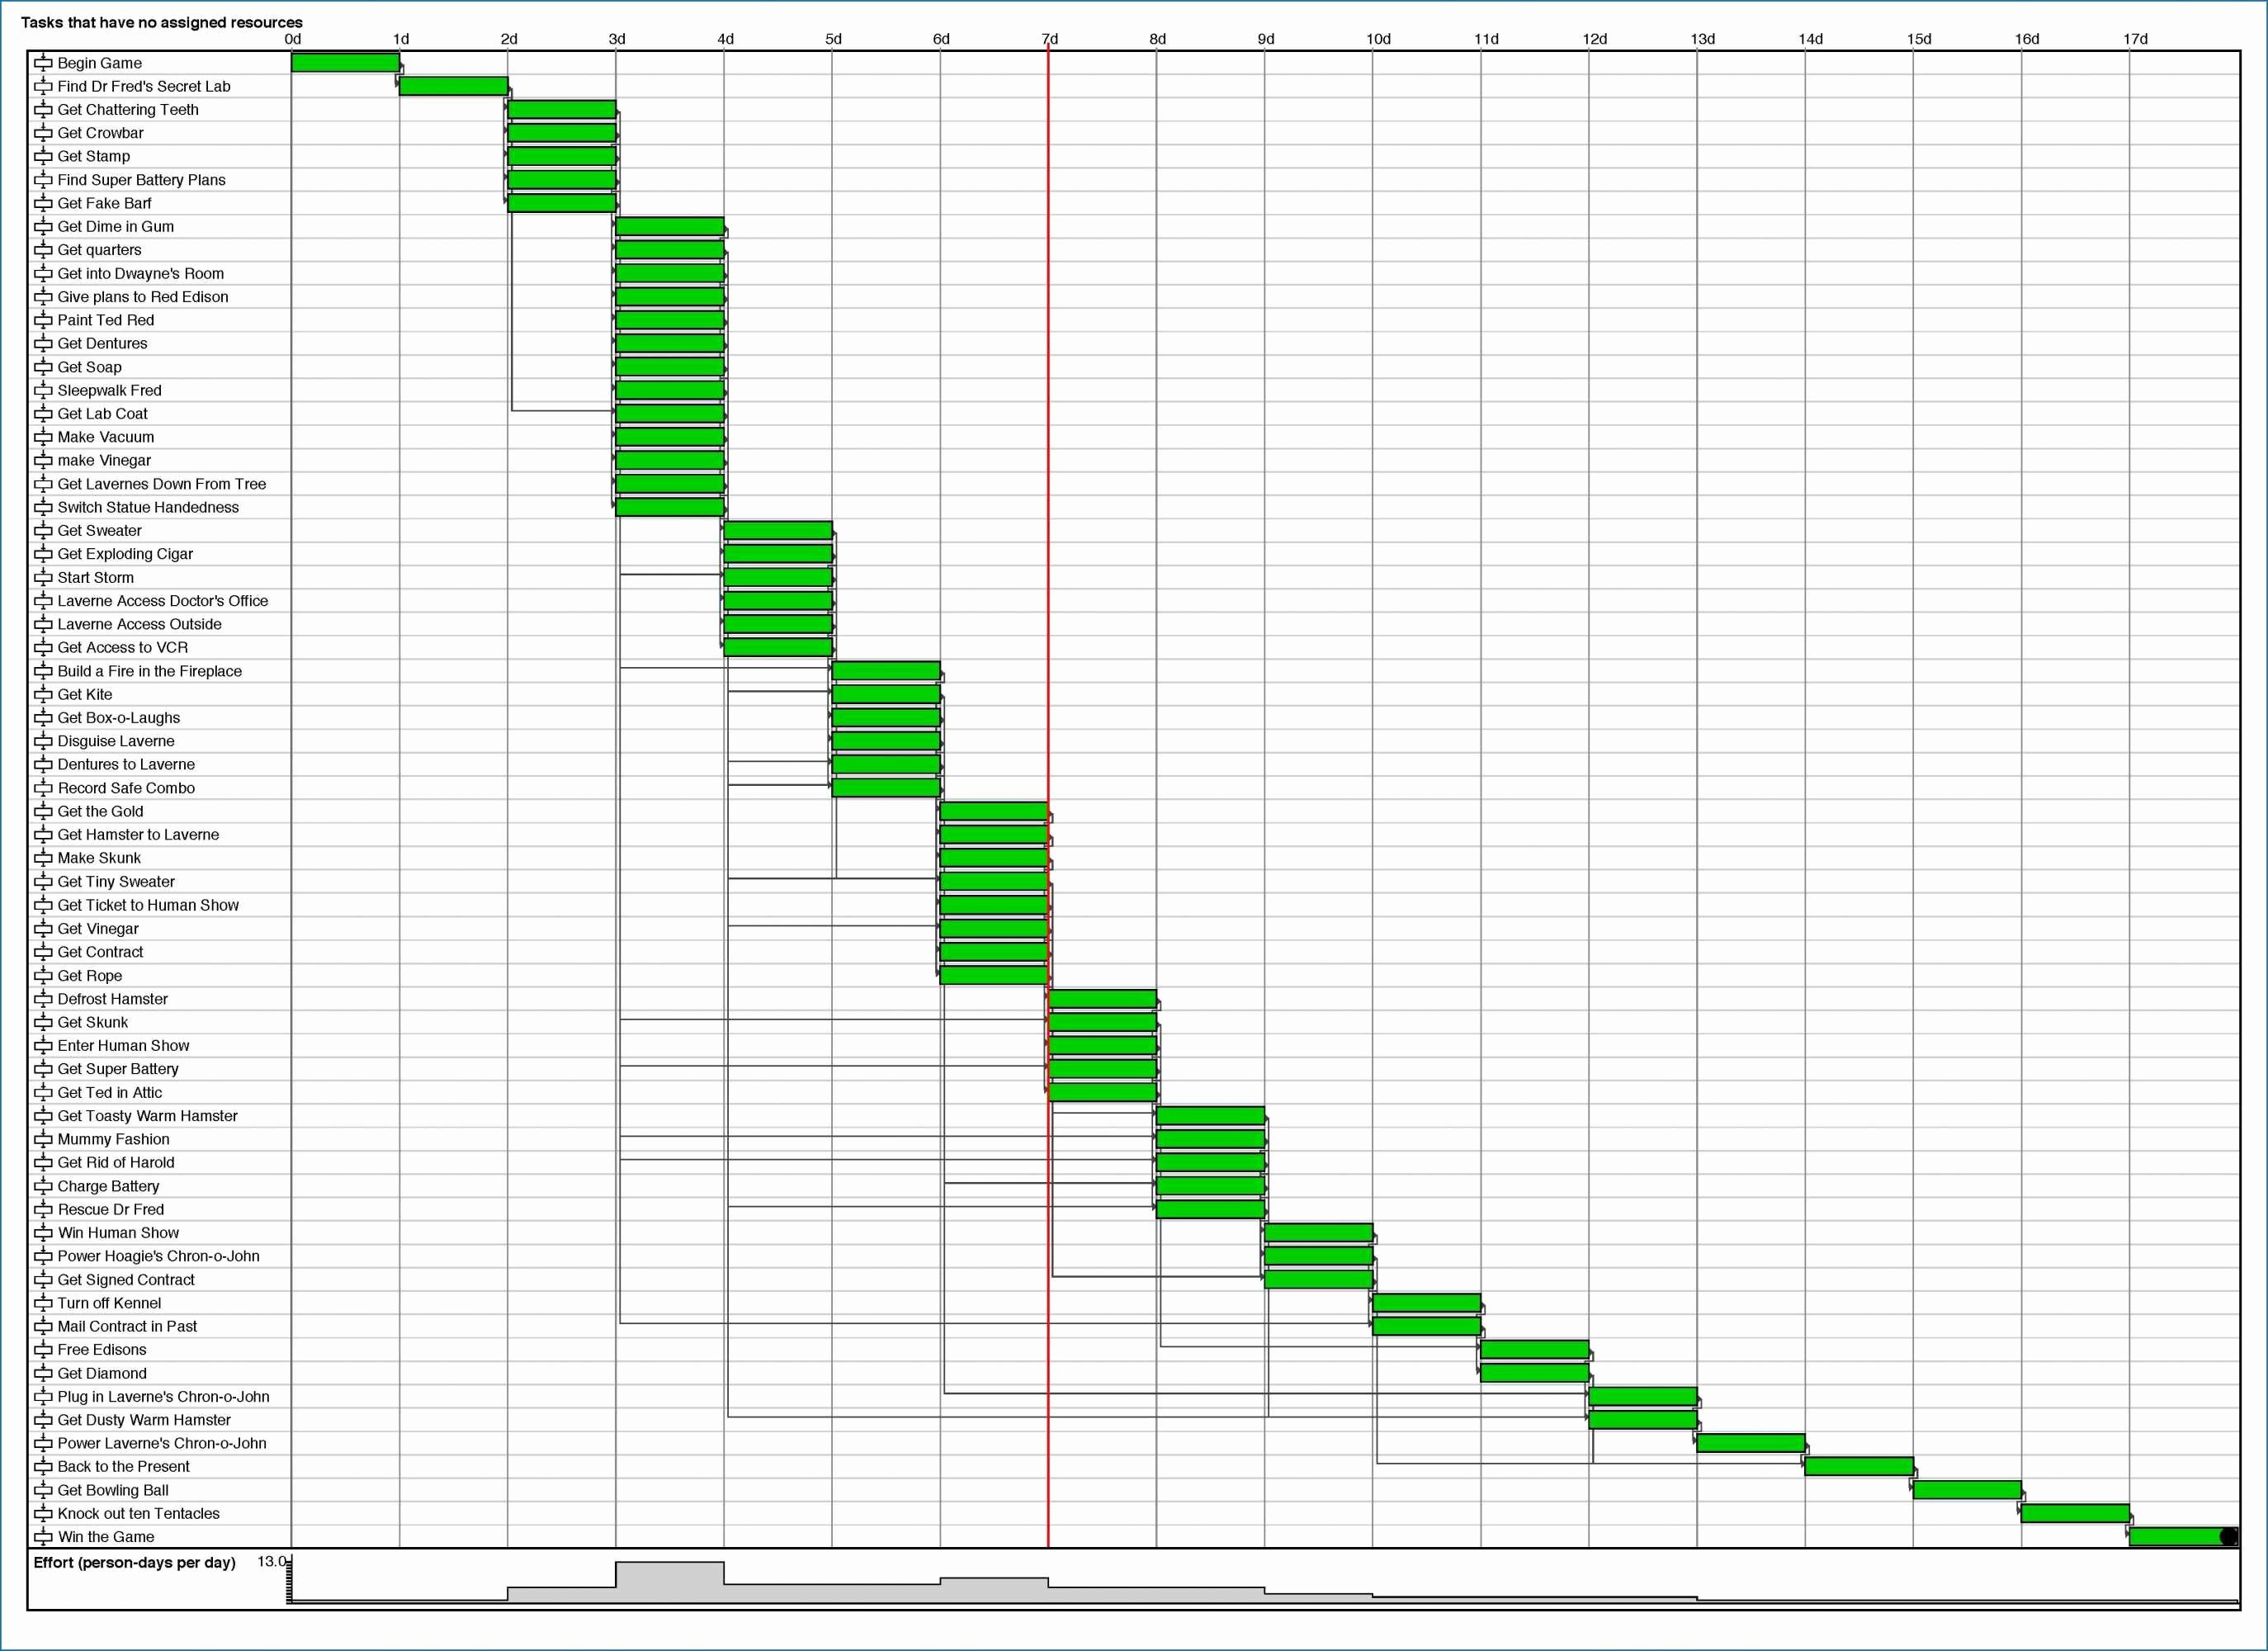 Kalender 2019 Excel Download Más Caliente Excel Monatskalender Erstellen Beispiele Excel Kalender 2019 Of Kalender 2019 Excel Download Más Arriba-a-fecha 14 Jahresplaner 2017 Excel